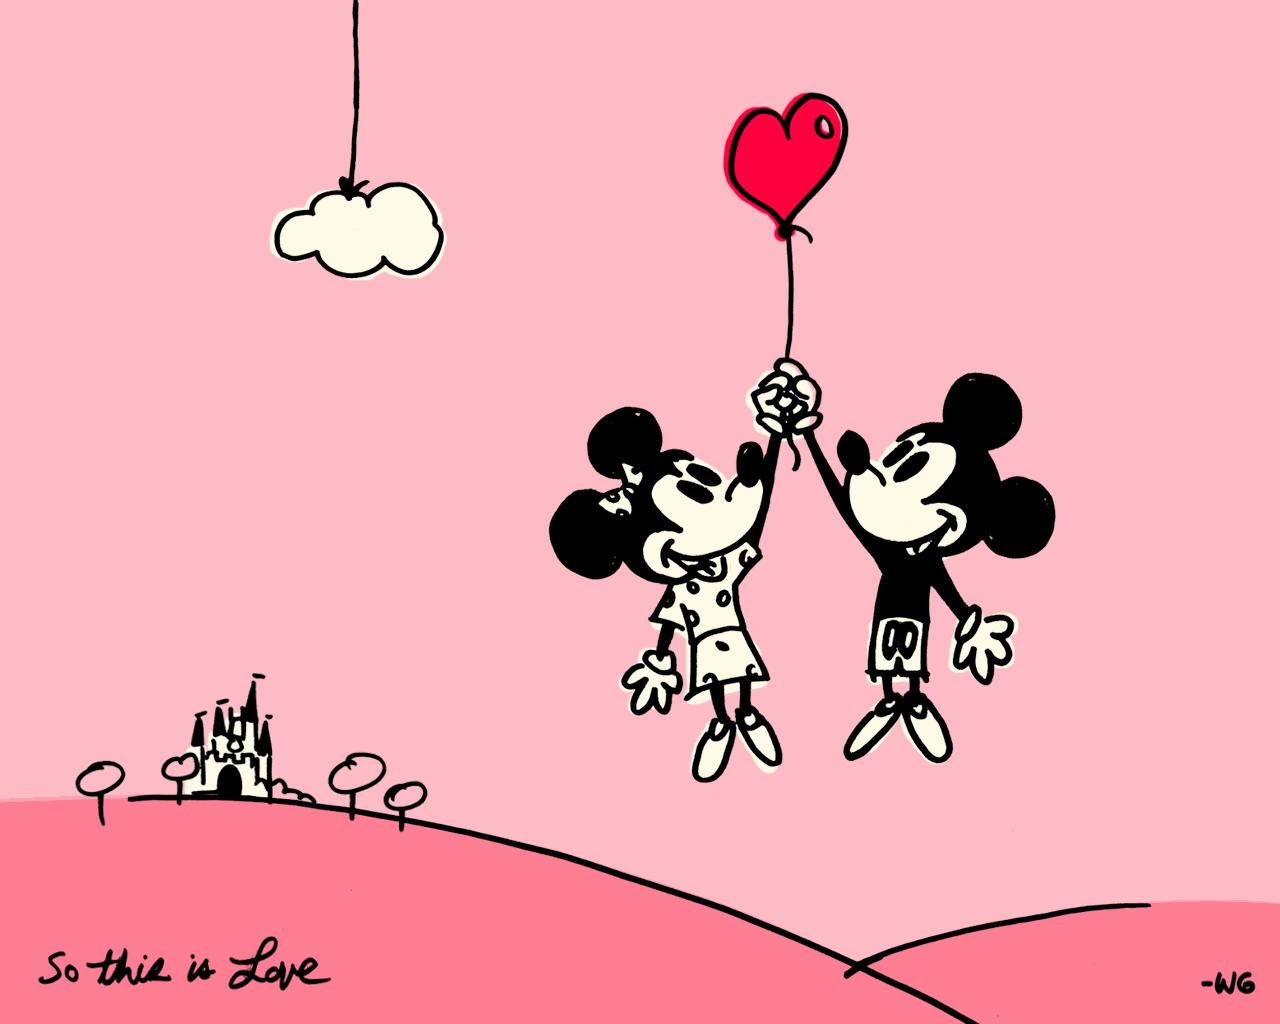 so this is love' : 【ディズニー】ミッキーマウスのpcデスクトップ壁紙